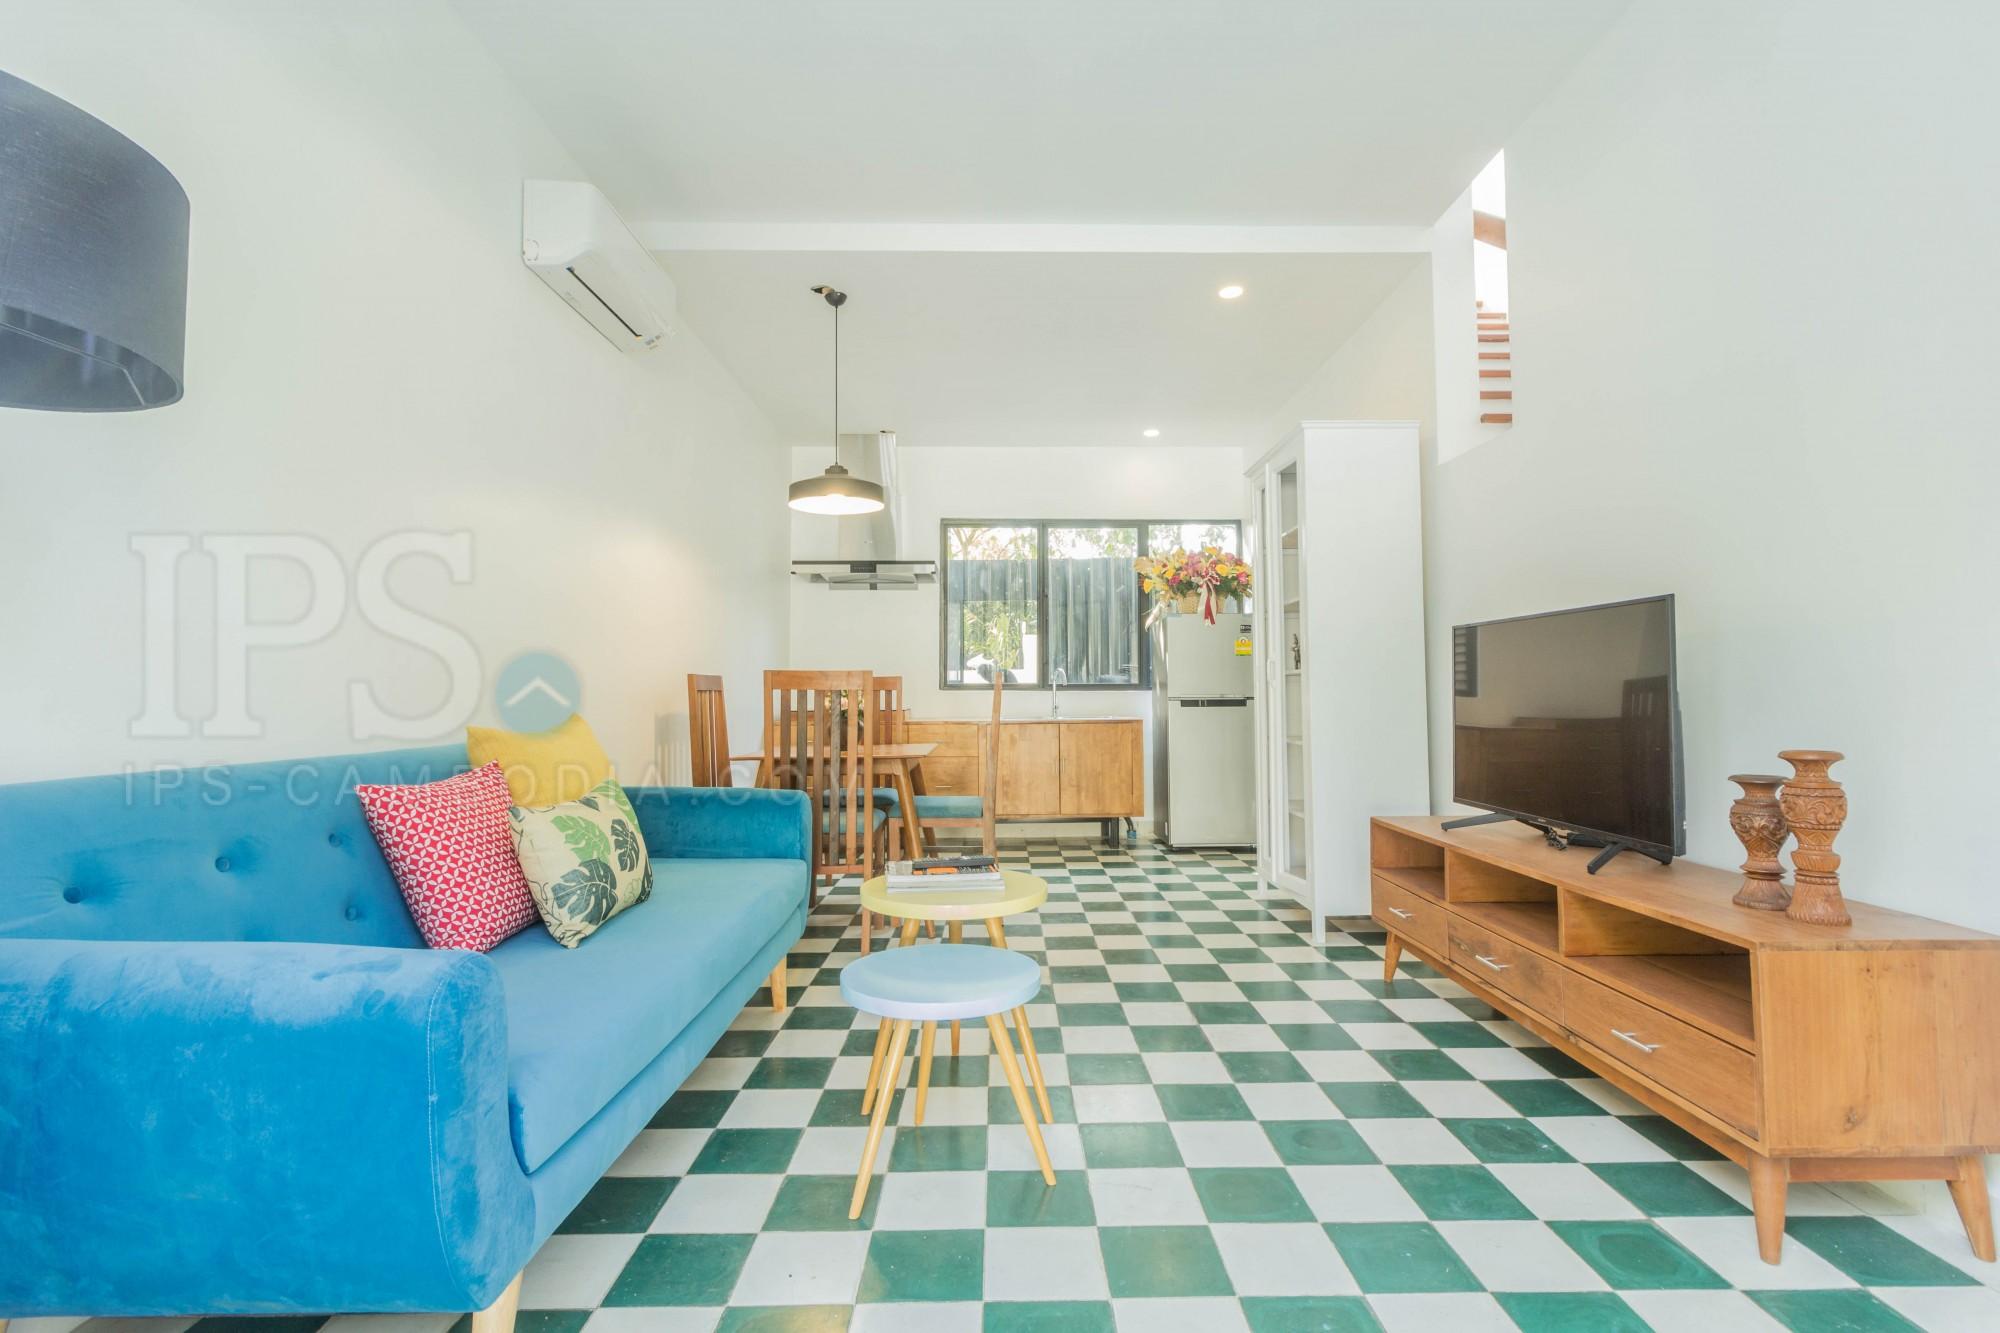 1 Bedroom Apartment For Rent - Kouk Chak, Siem Reap